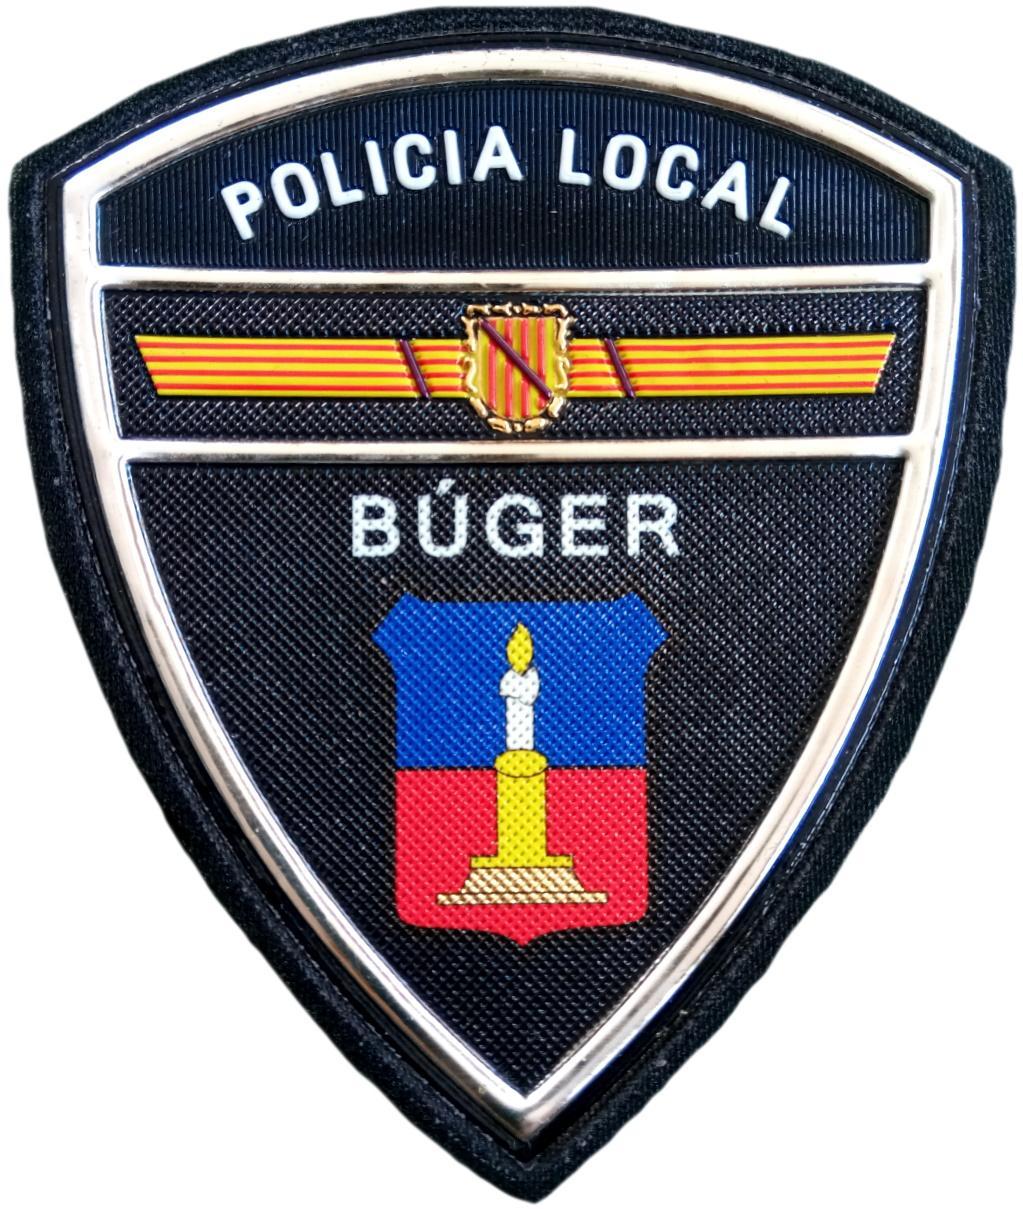 Policía Local Búger parche insignia emblema distintivo